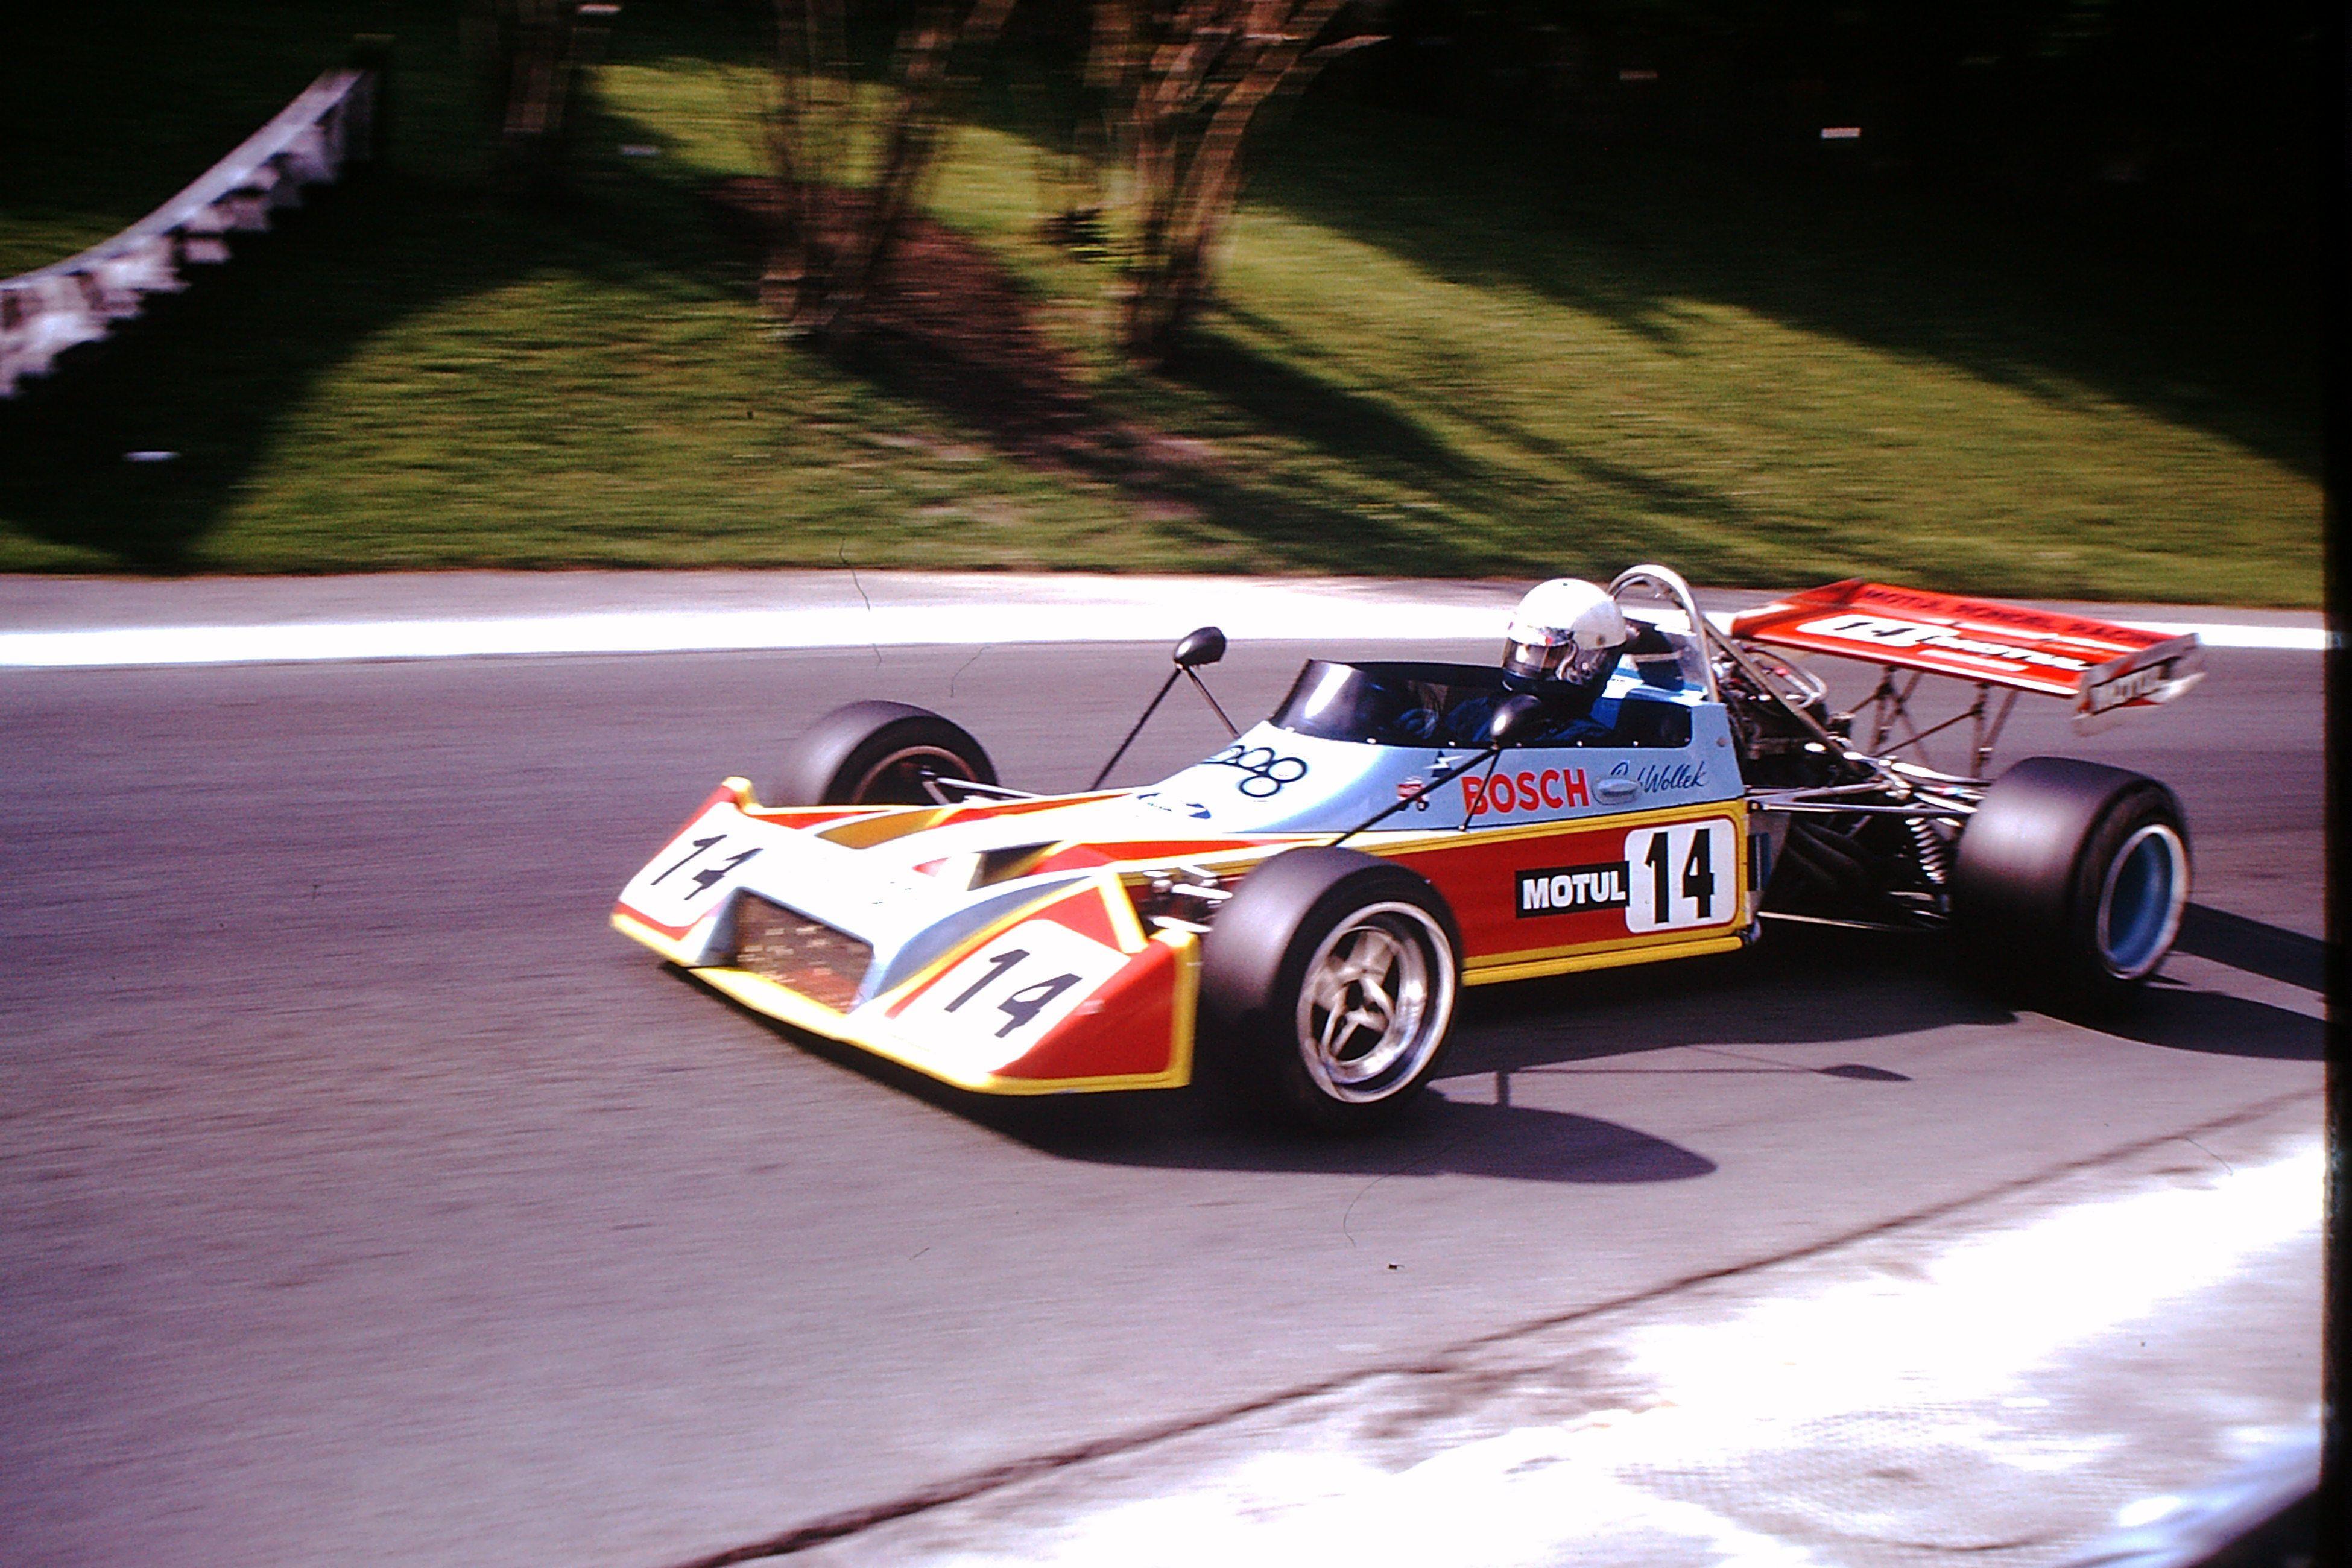 Bob wollek motul m1 cosworth bda motul rondel racing xxxiii grand prix automobile